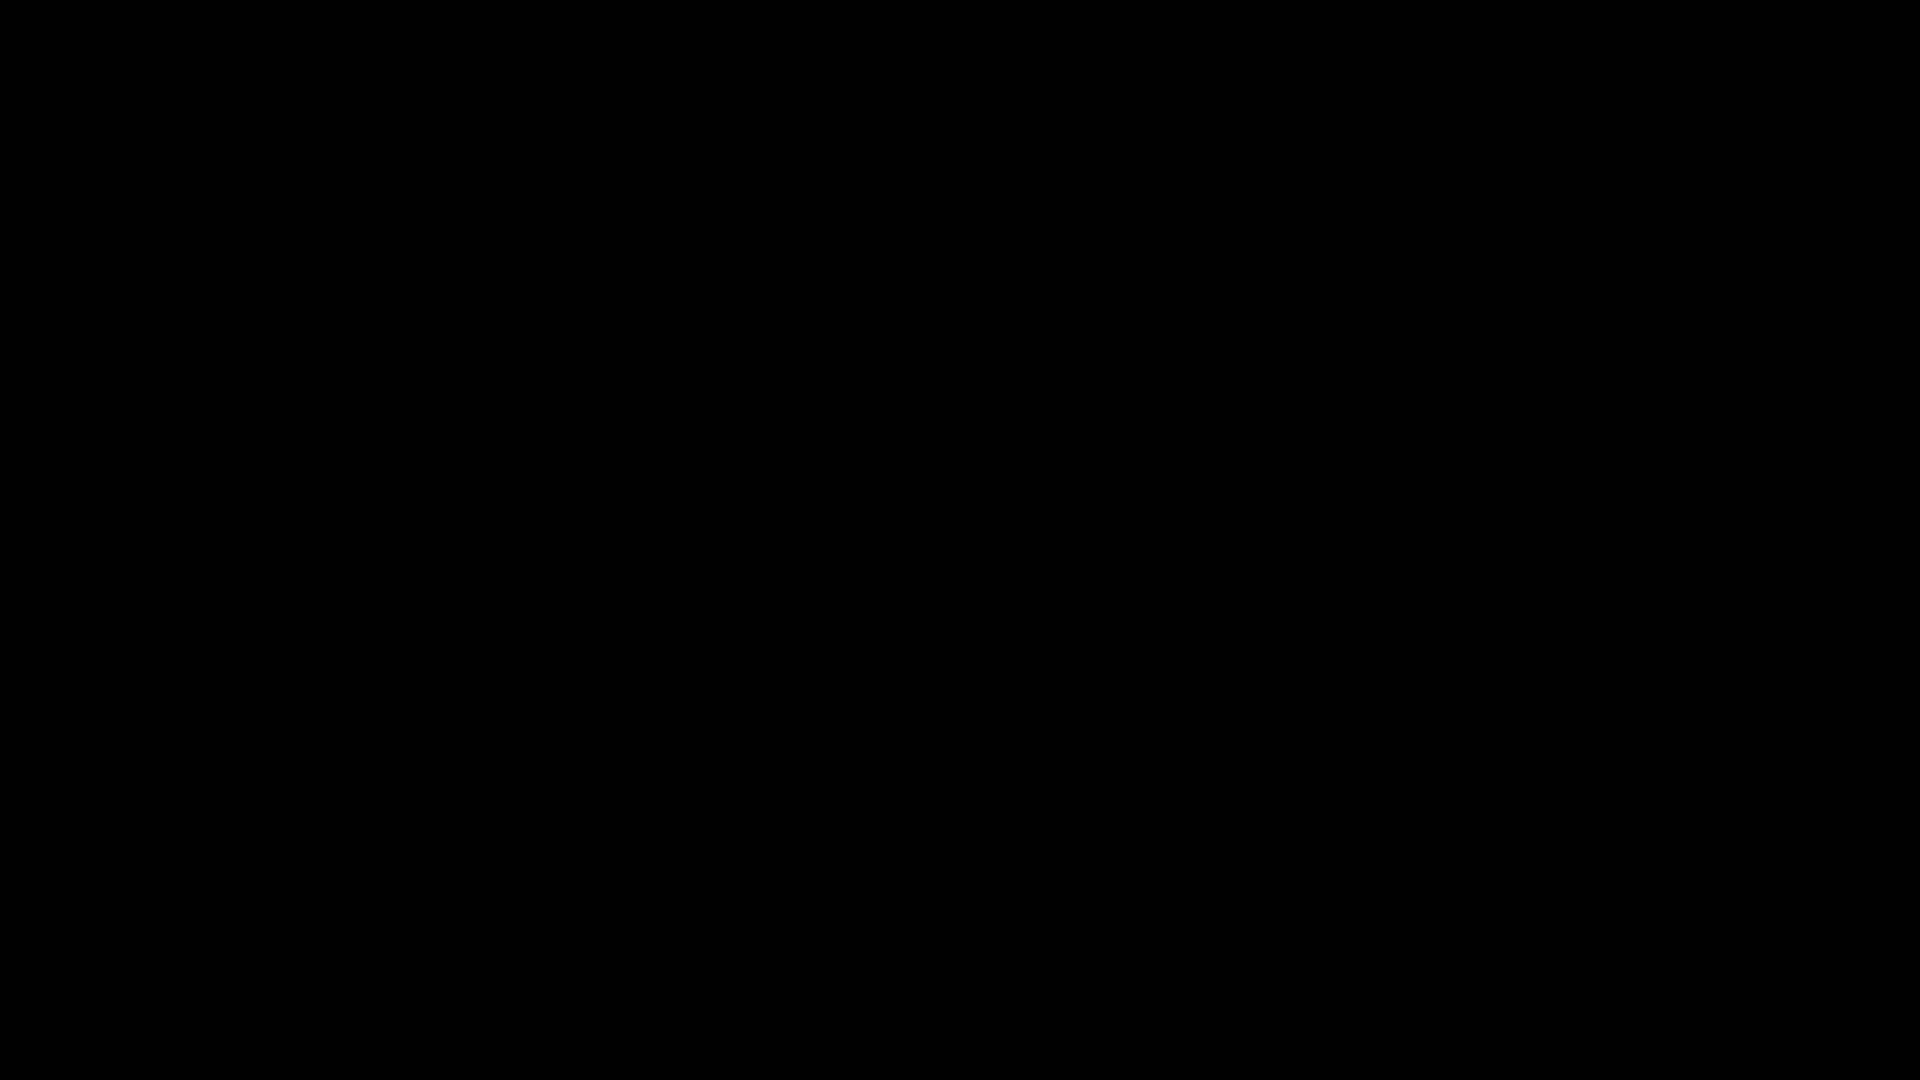 Plain Black Background Images Hd   clipartsgramcom 1920x1080